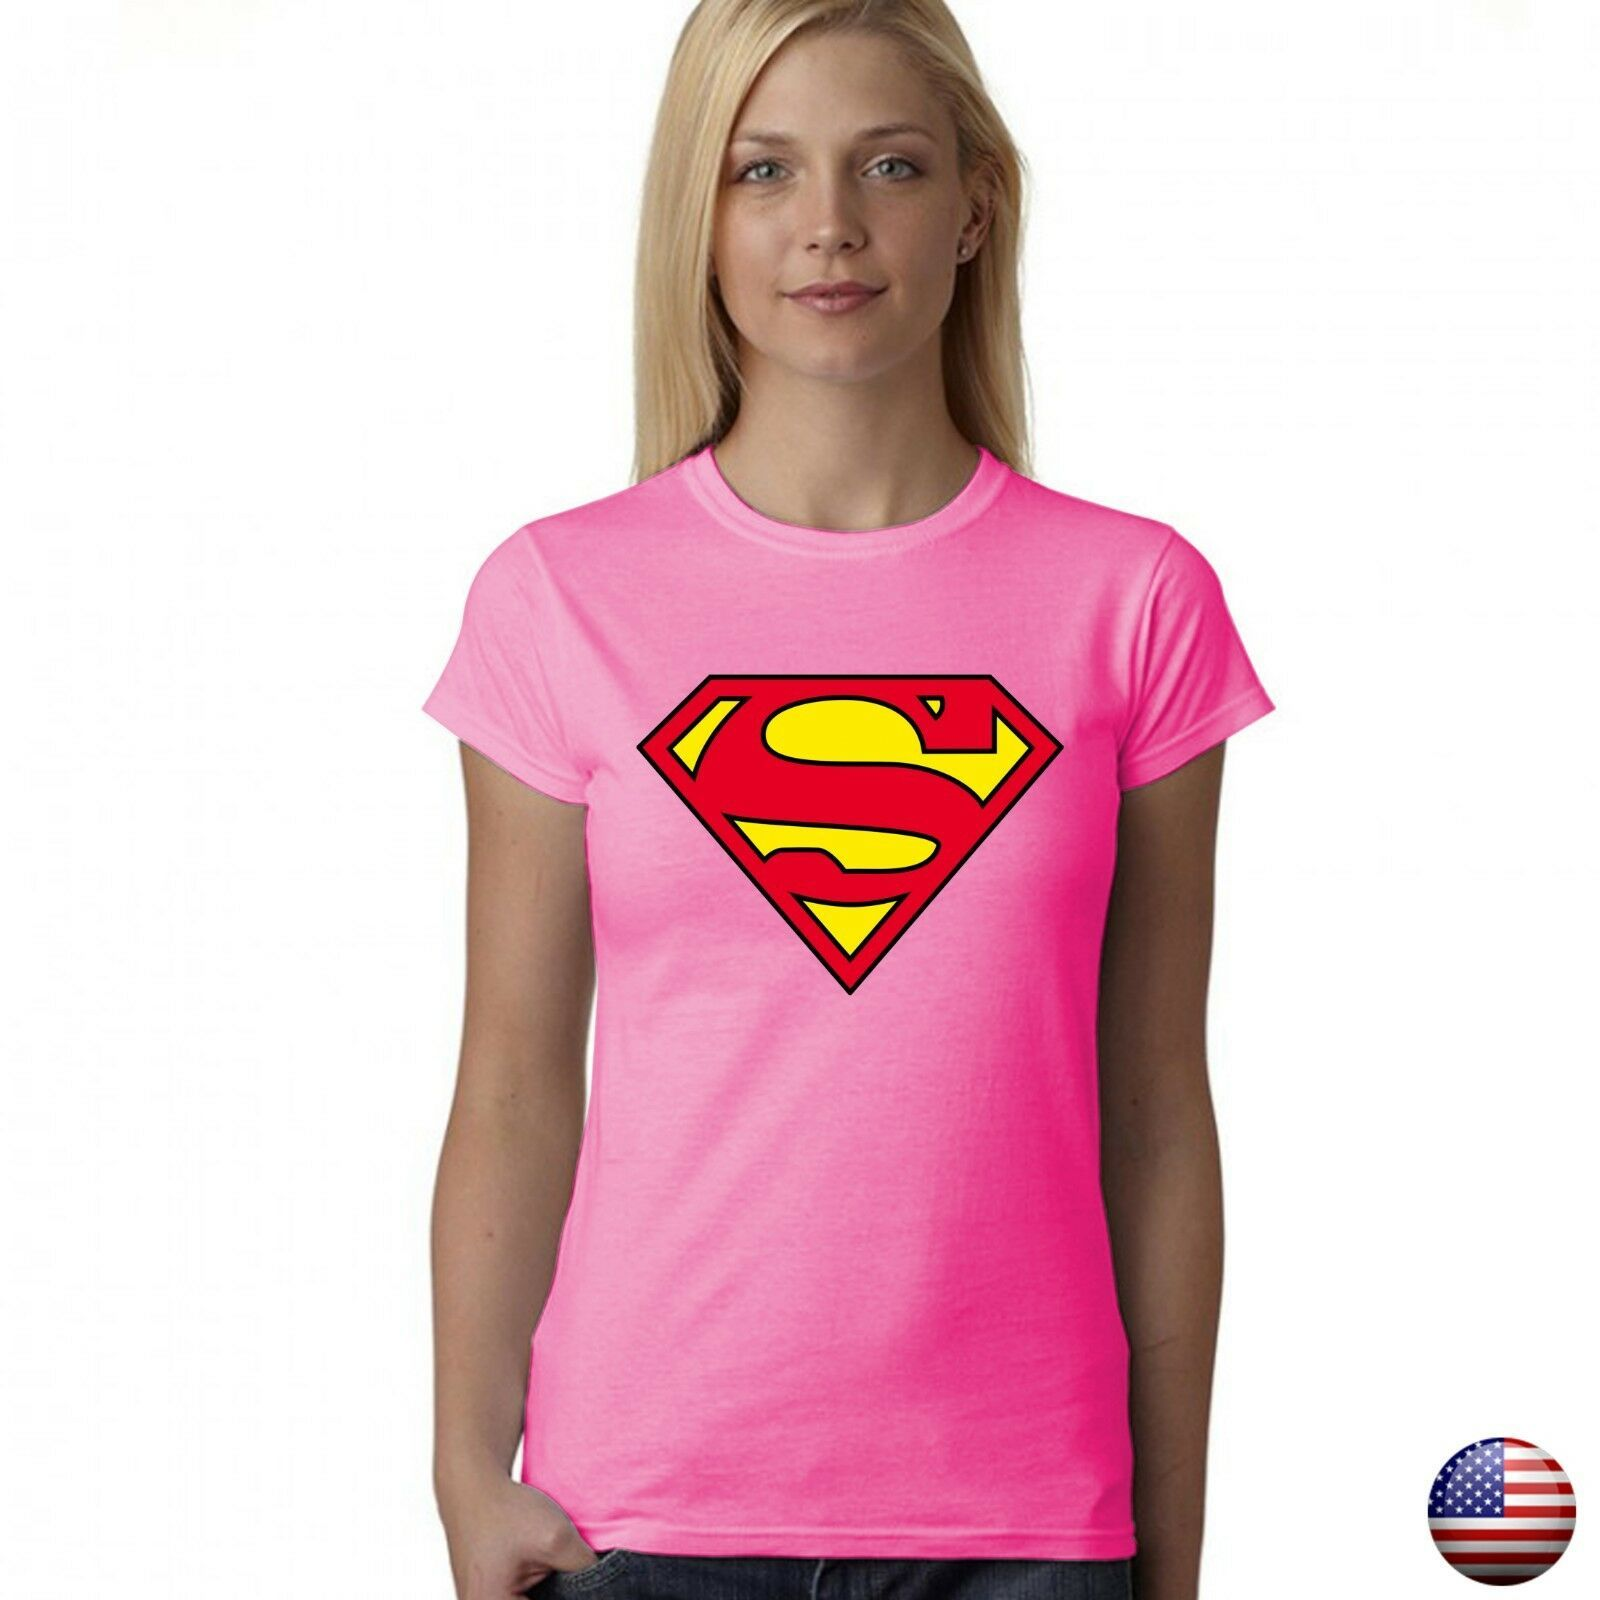 SUPERMAN JUSTICE LEAGUE CLASSIC LOGO SUPERHERO WOMEN JUNIOR FIT PINK T-SHIRT 160